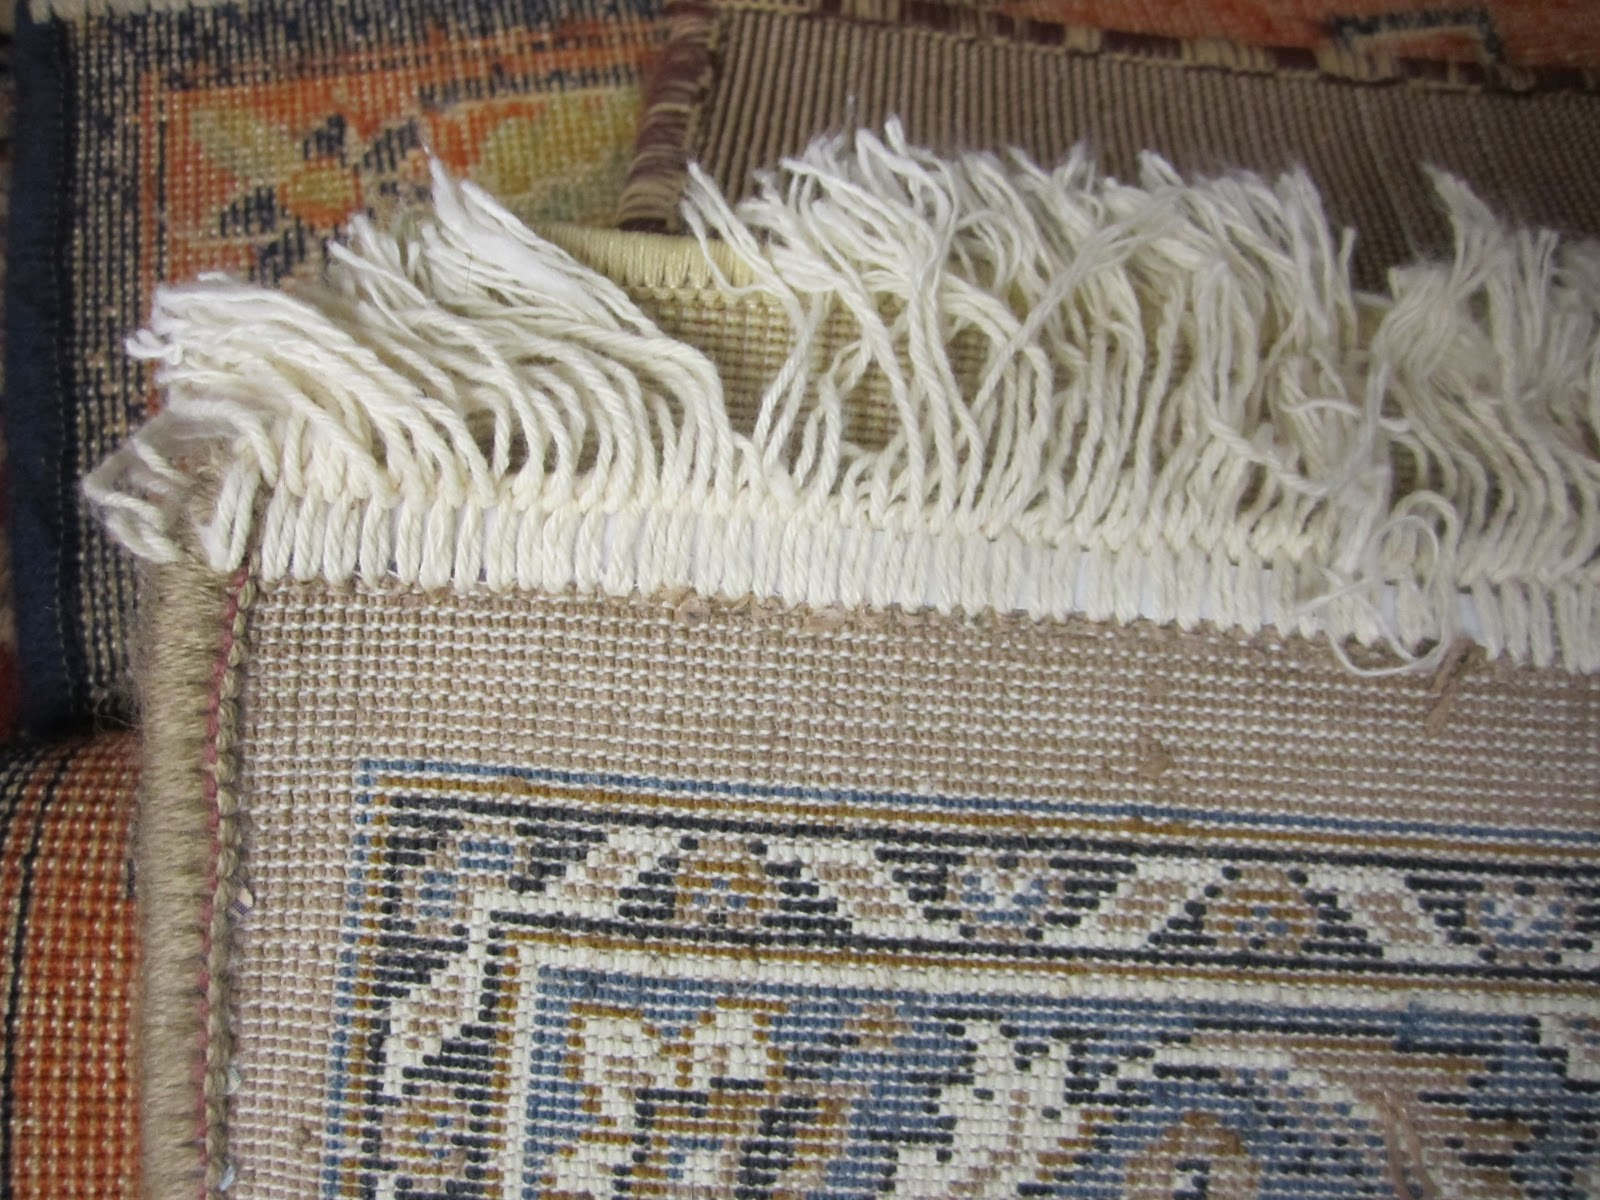 Machine made rug with sewn on fringe.